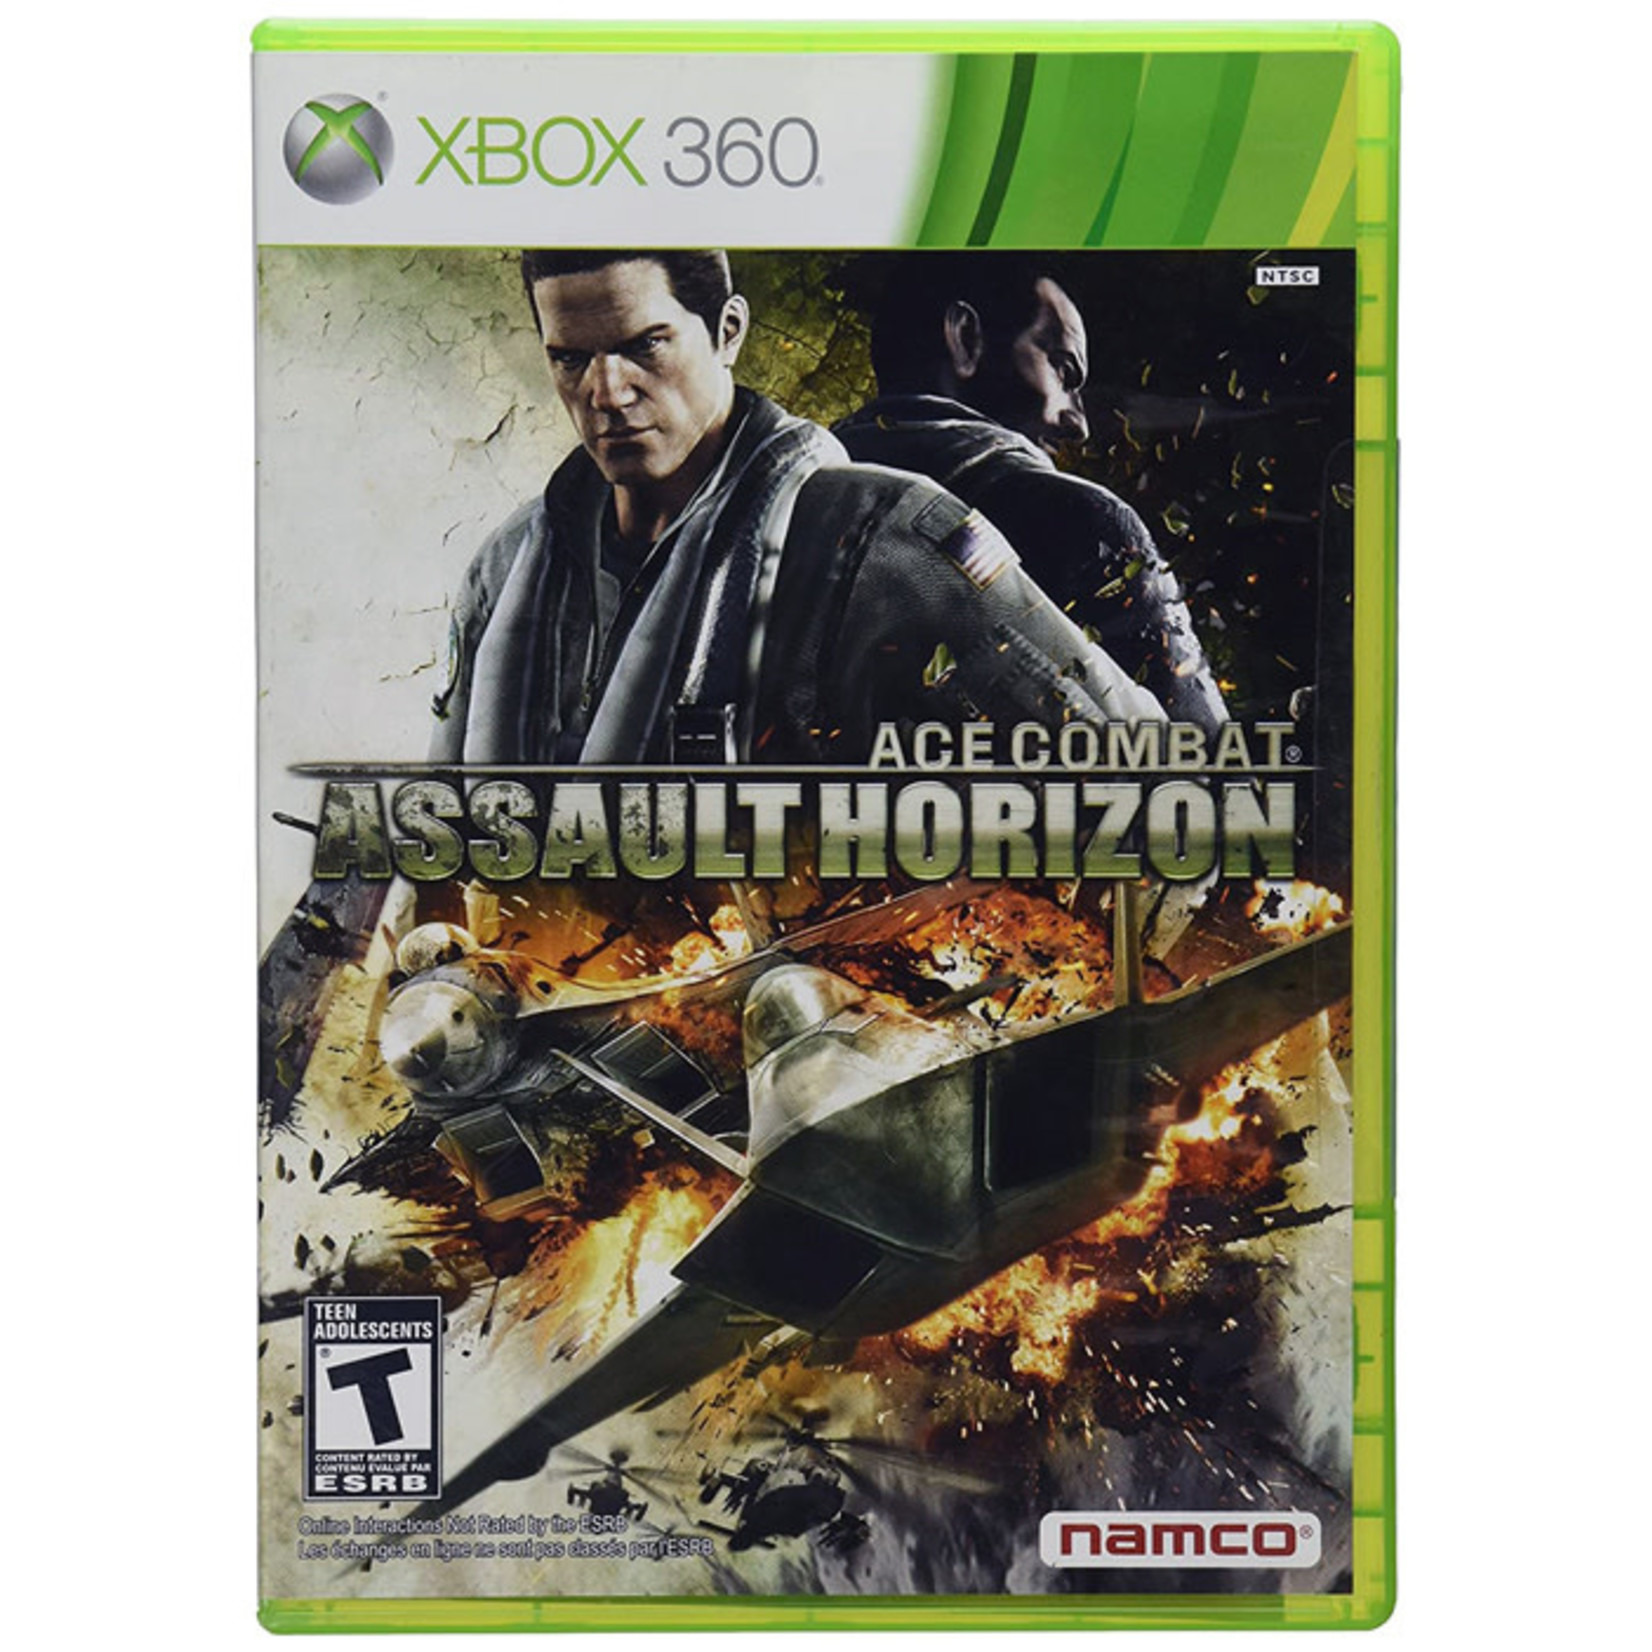 X3U-Ace Combat: Assault Horizon